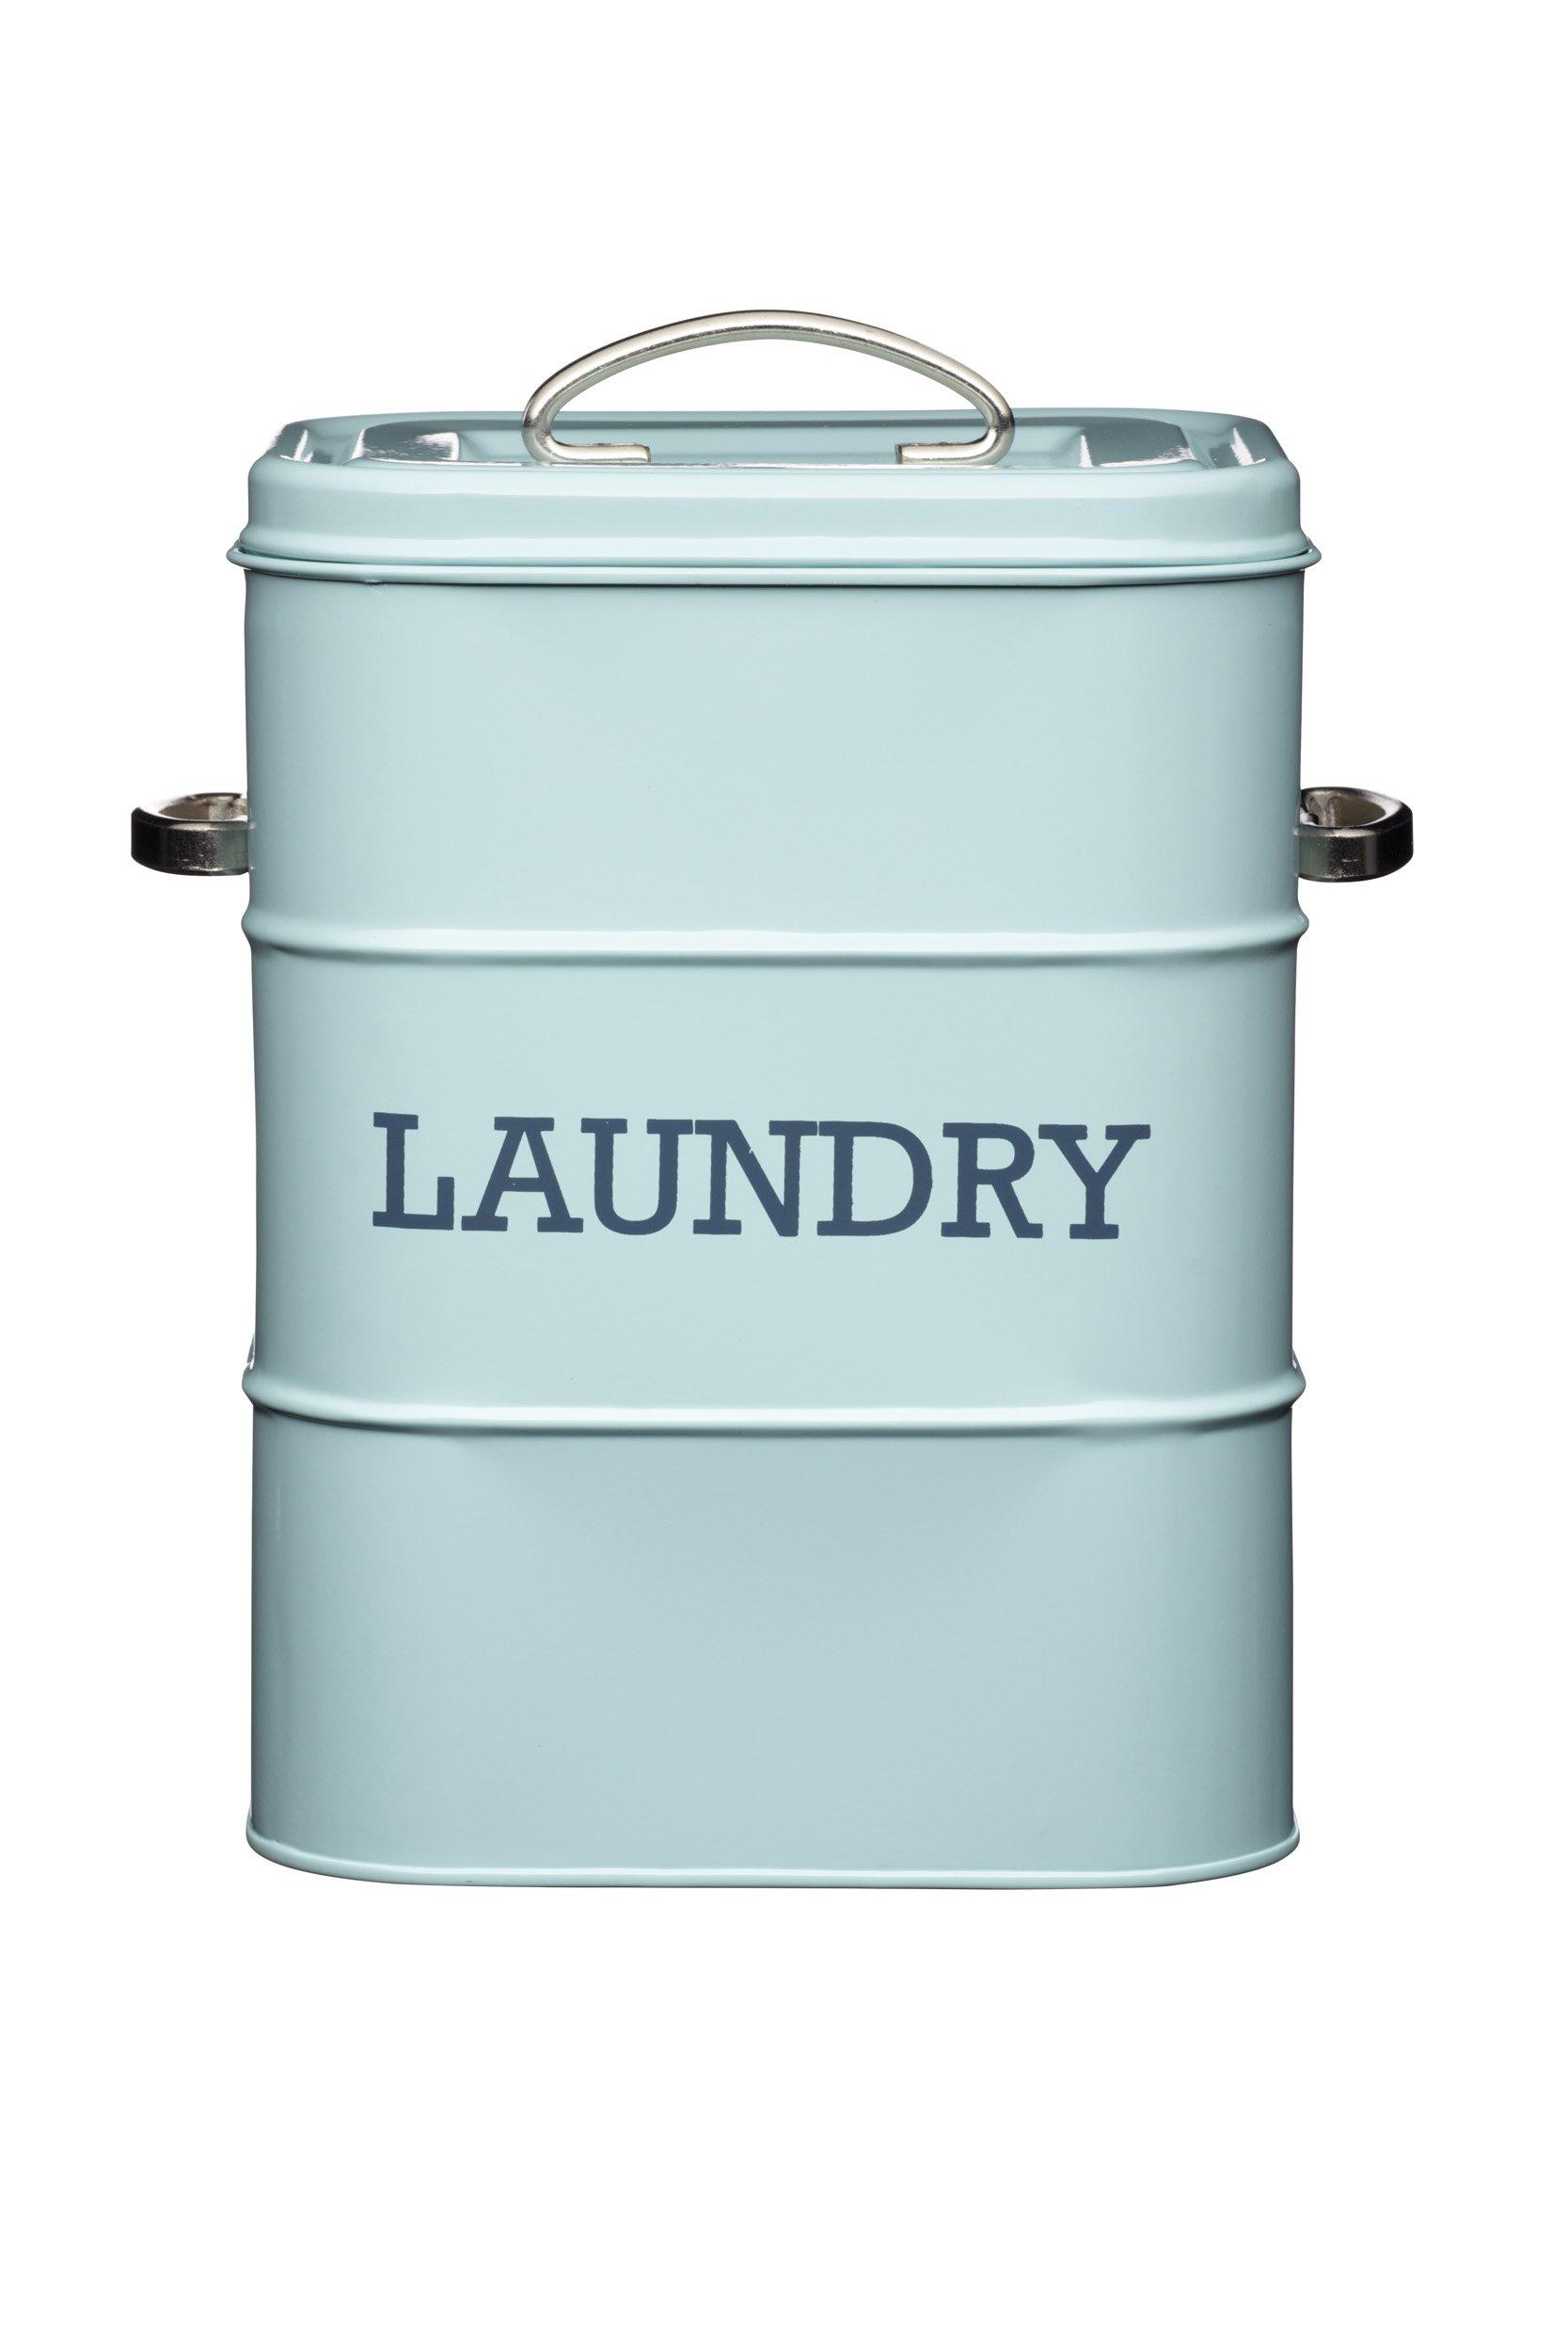 Kitchen Craft Living Nostalgia Laundry Soap Tin Vintage